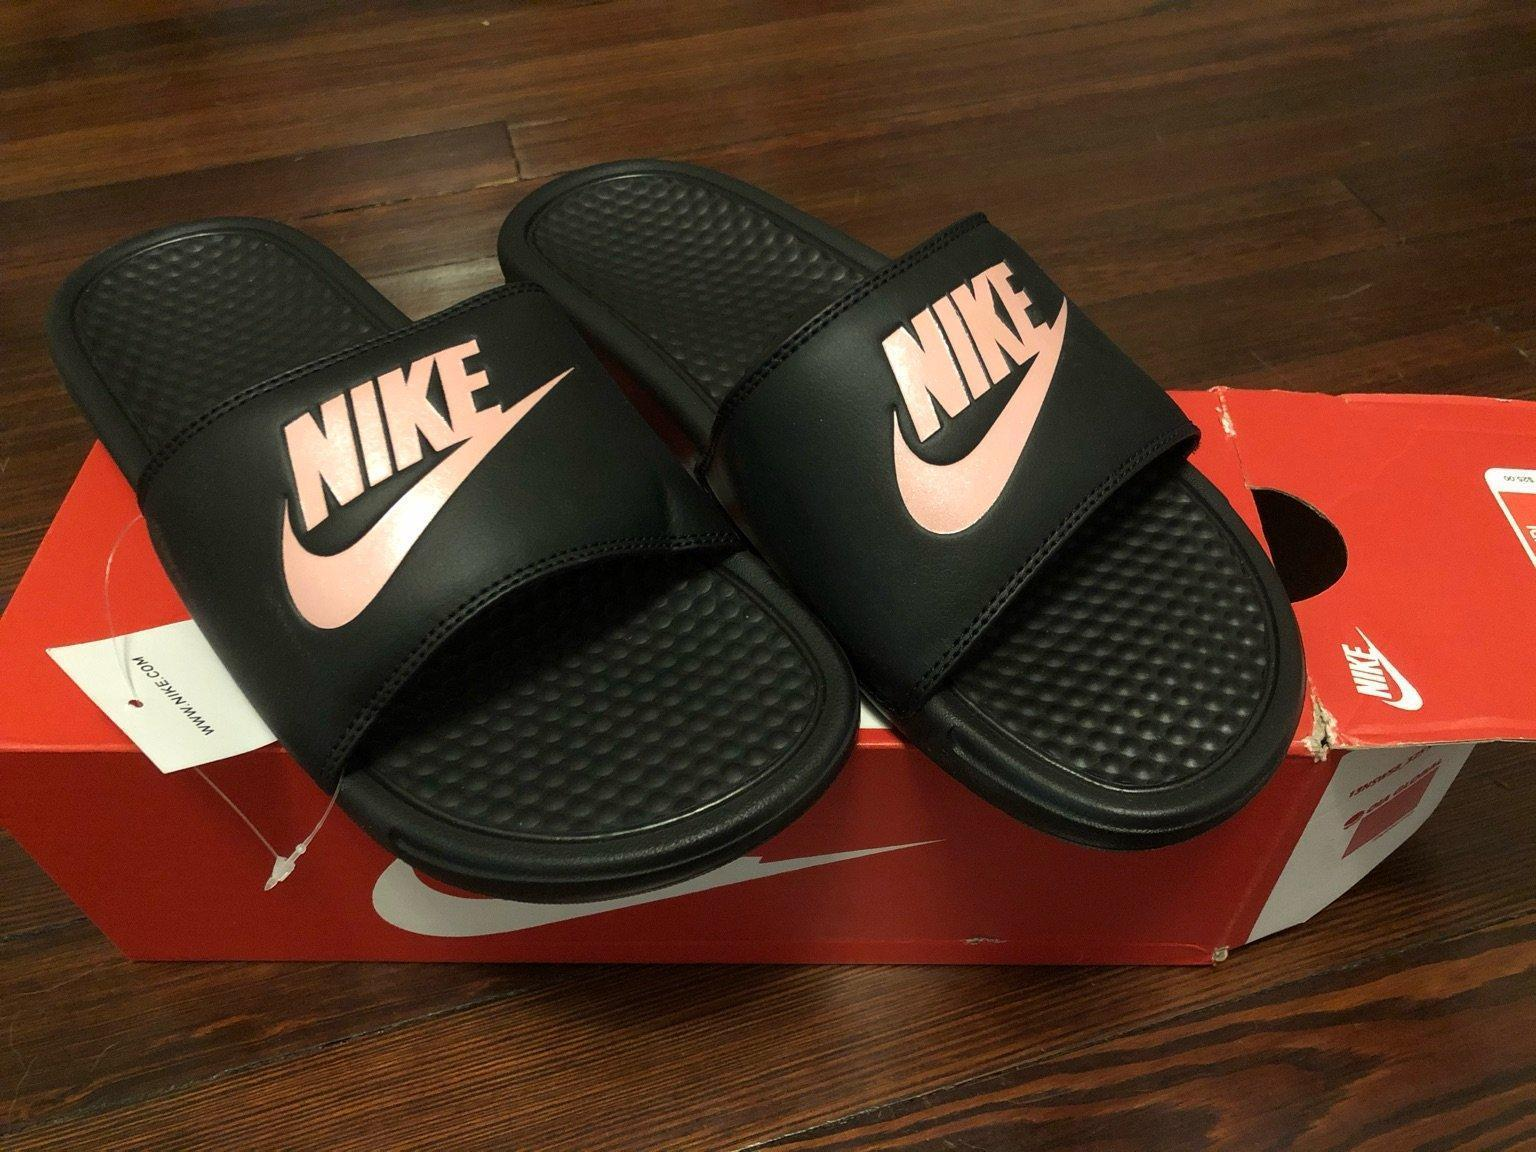 raffle-shoes-3.jpg